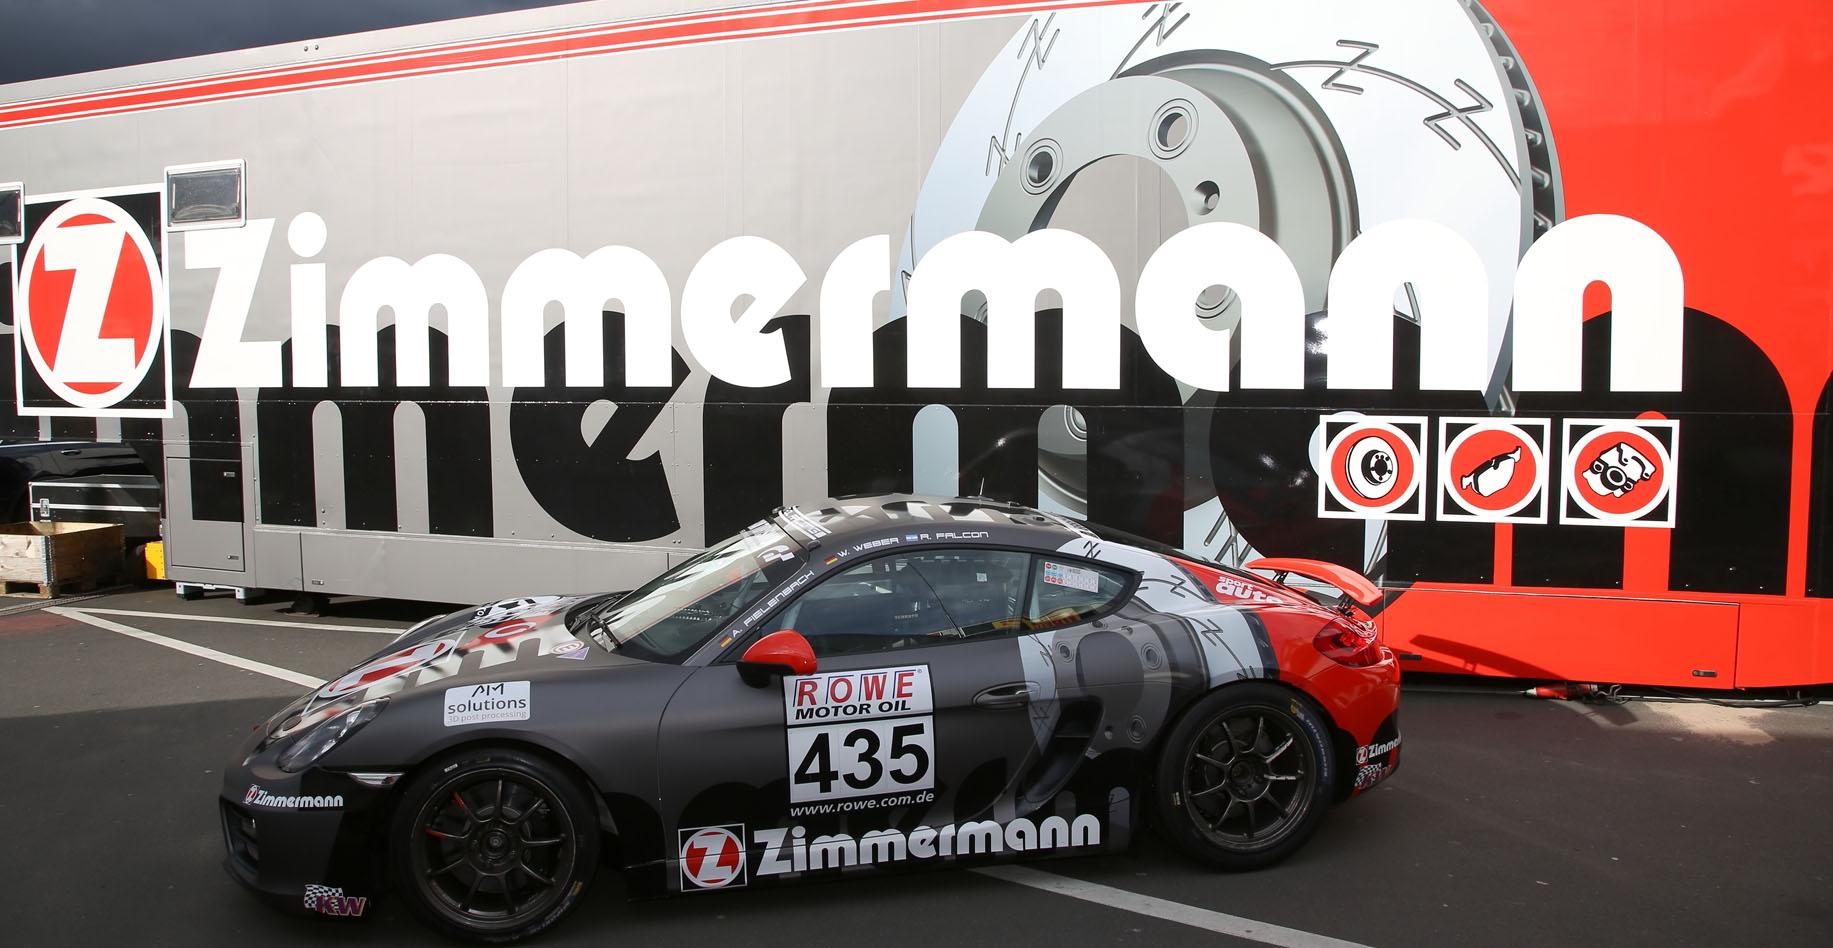 Zimmermann_FAQ